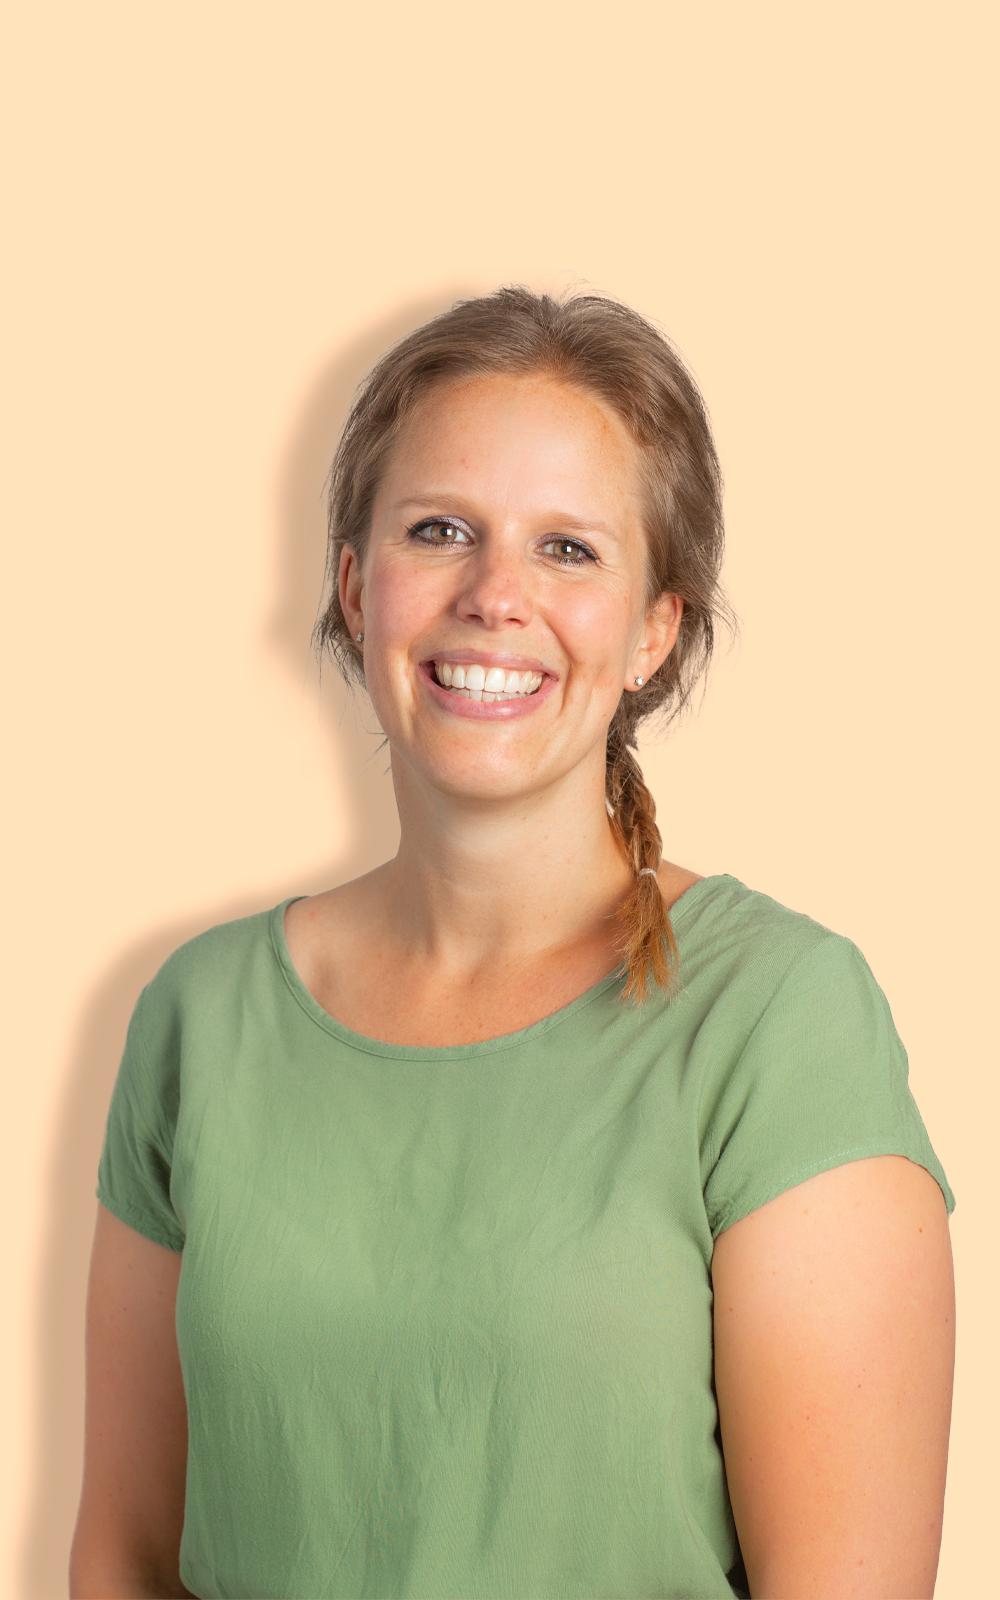 Simone Speelman